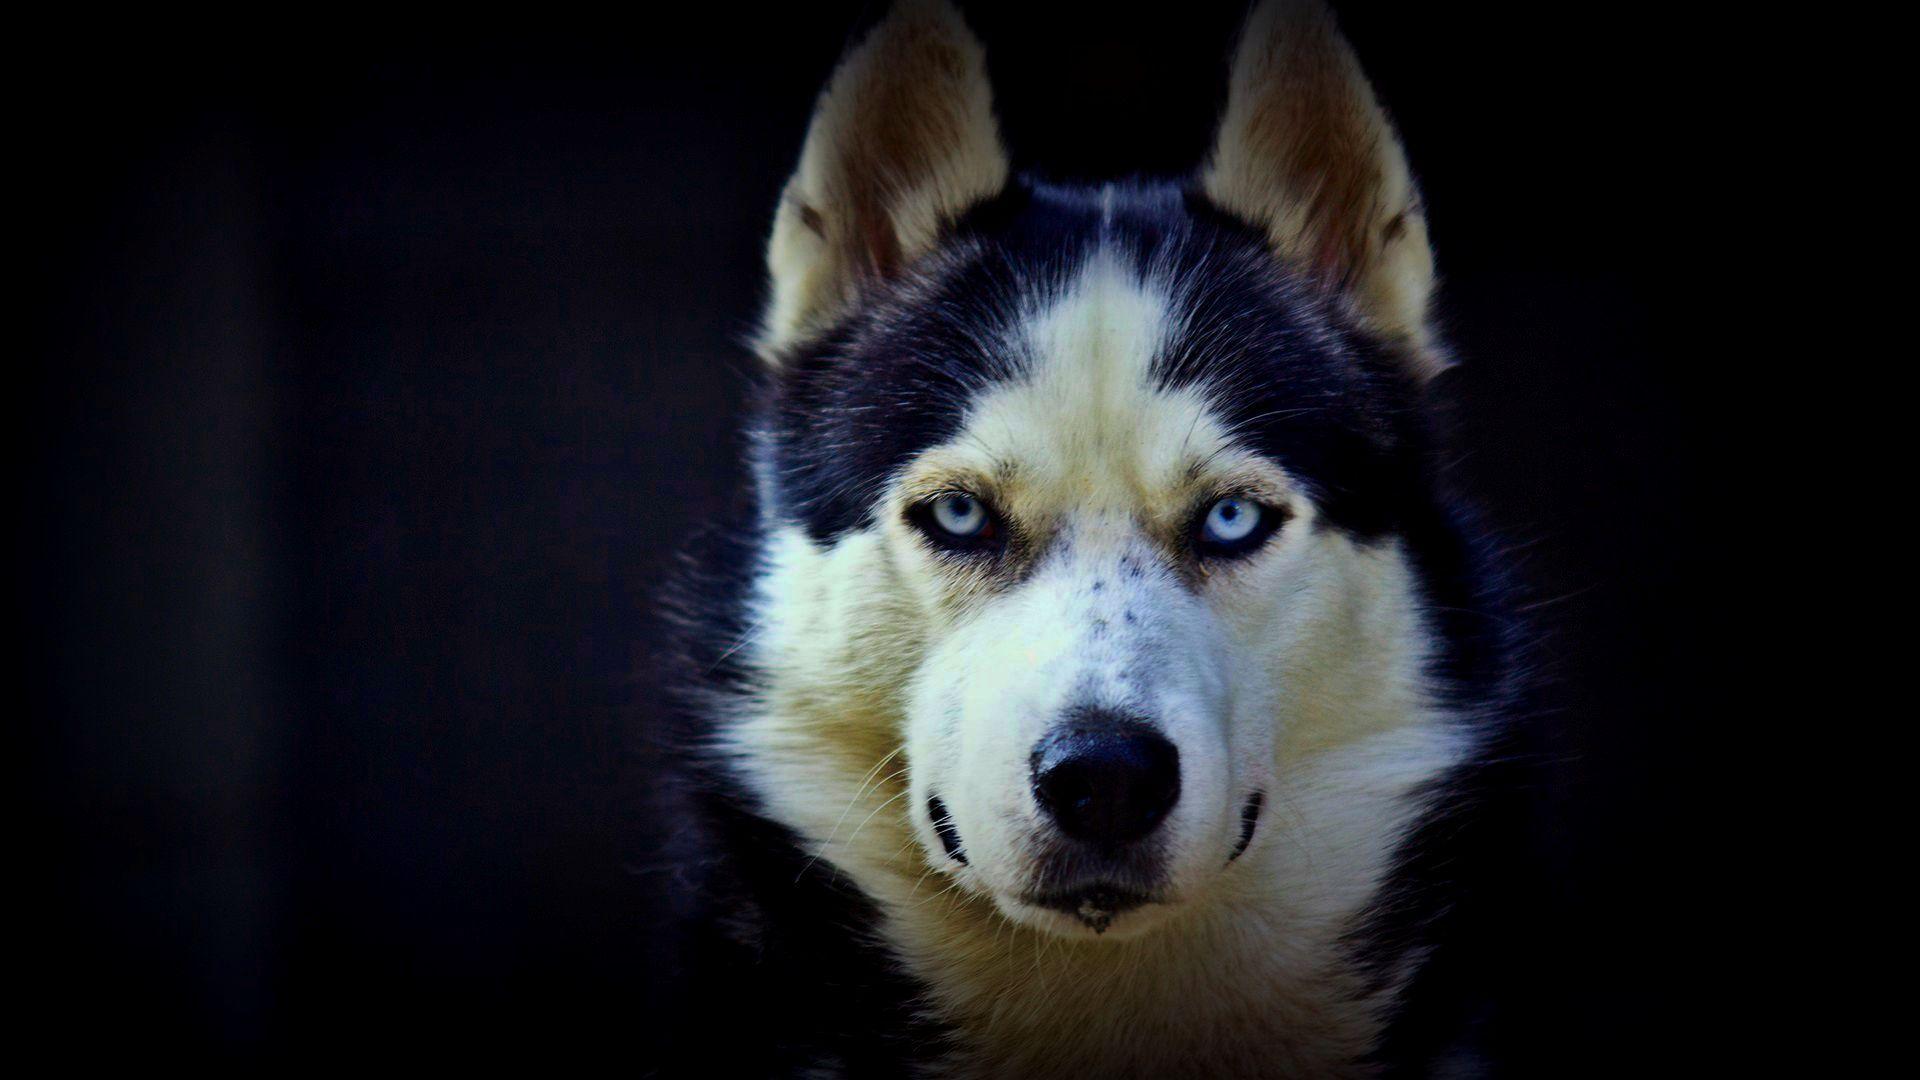 Hd Wallpapers 1080p Download Blogua Free Ultra Hd 3840x2160 High Definition Wallpaper High Definition Background 4 Husky With Blue Eyes Husky Husky Dogs